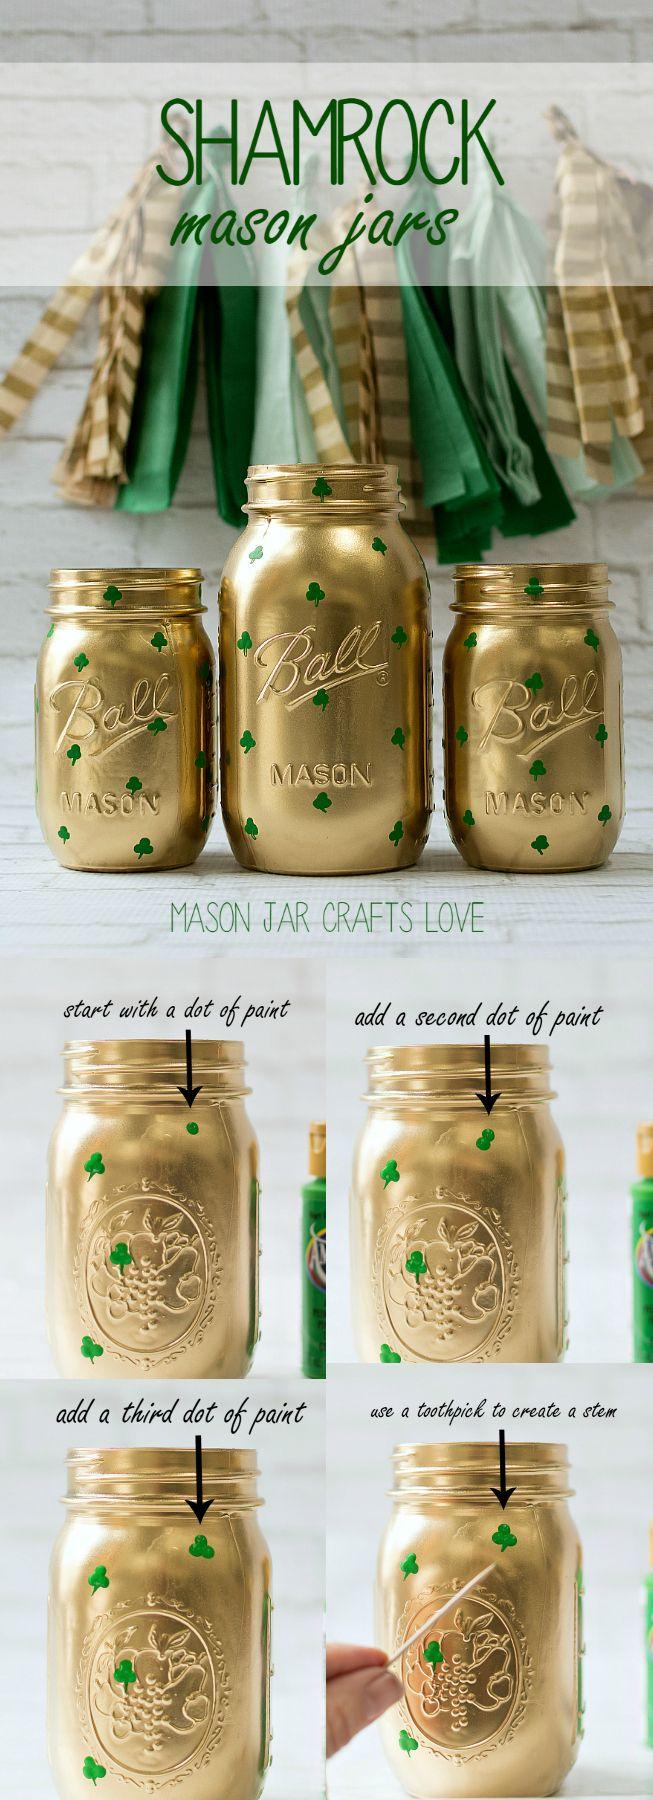 Shamrock Mason Jar Craft - St. Patrick's Day Decor, Party Decor Idea Using Mason Jars